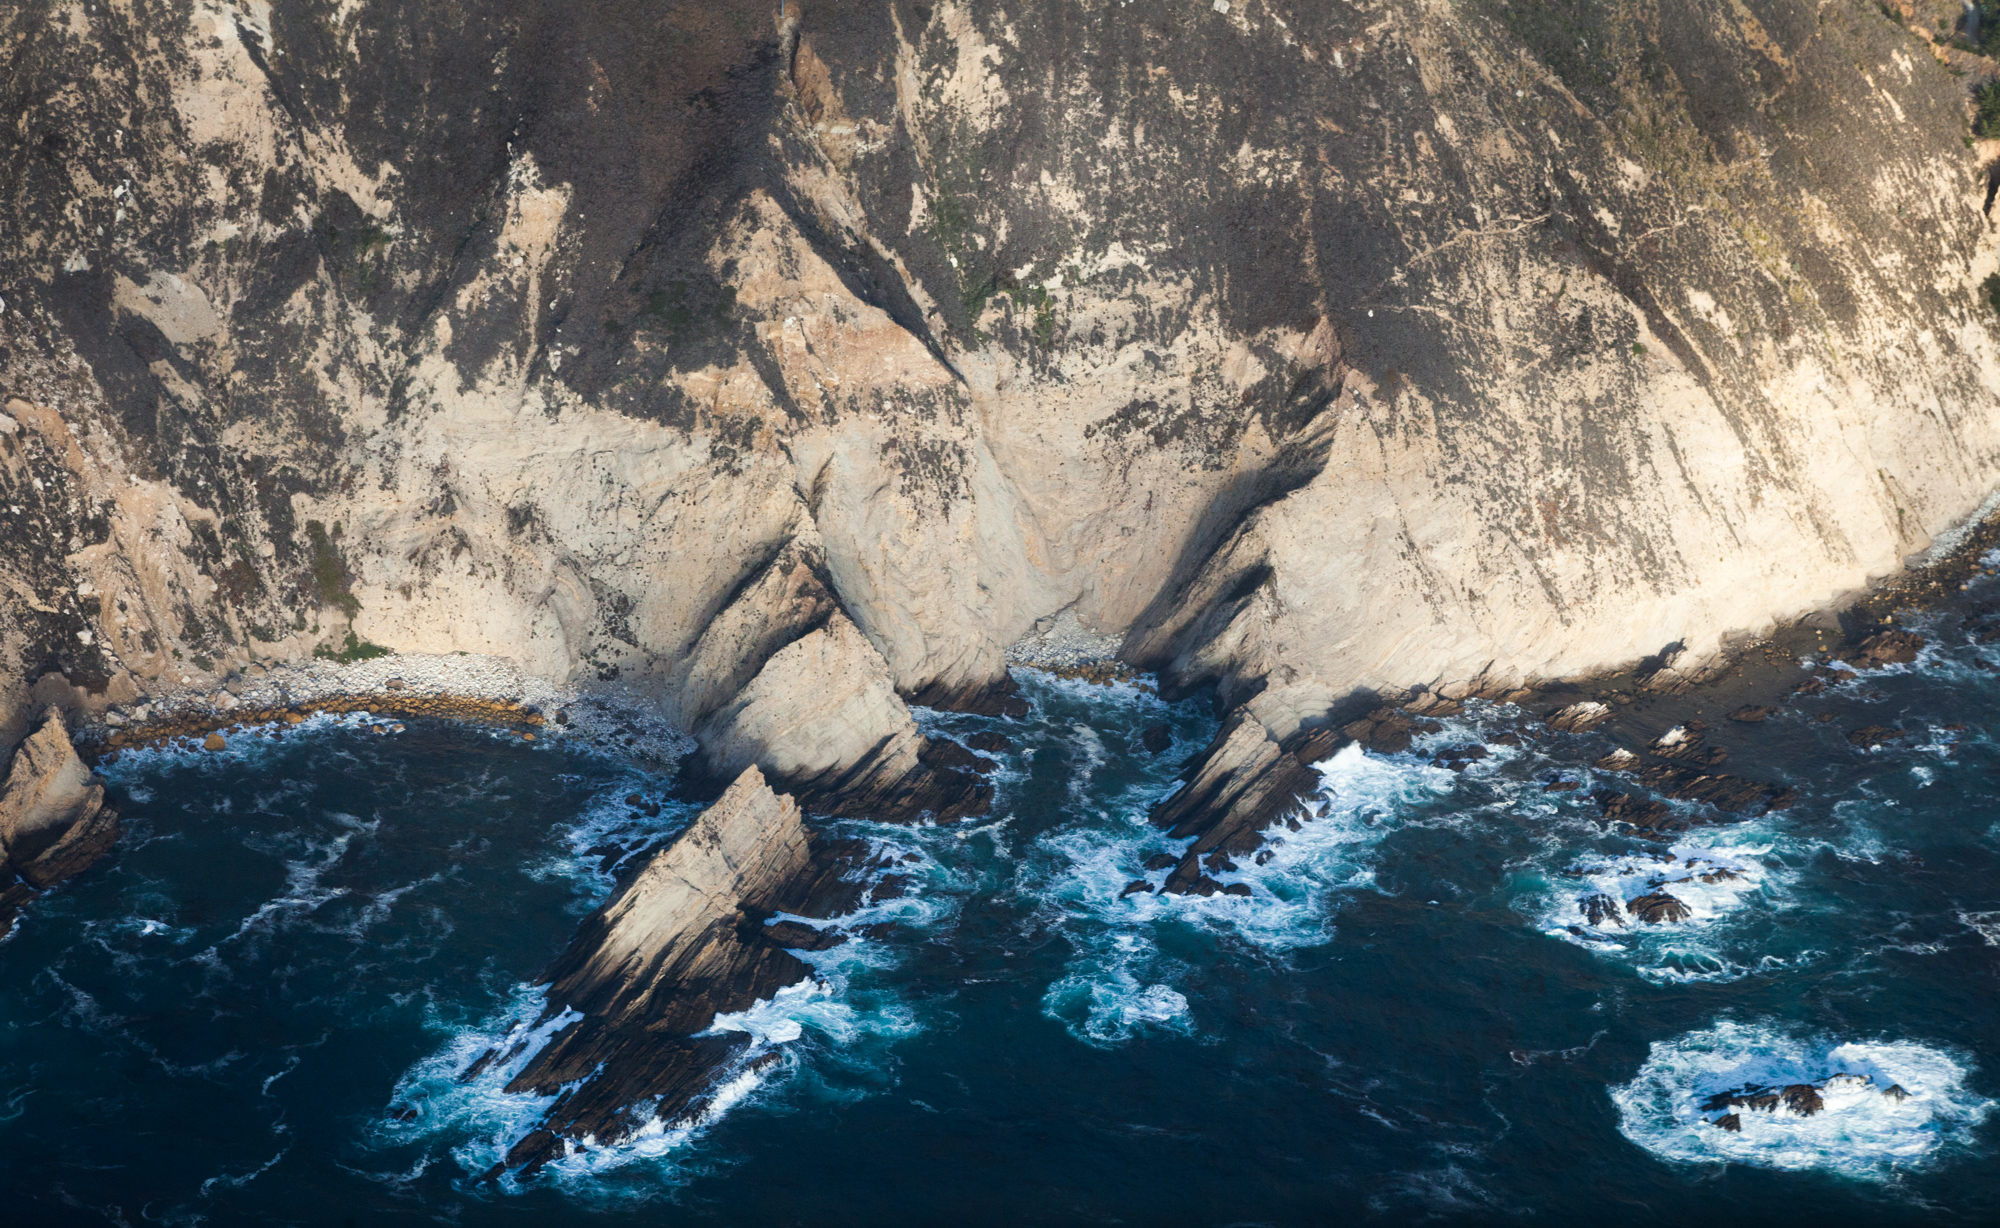 The wild and rugged coastline of California, 2015.